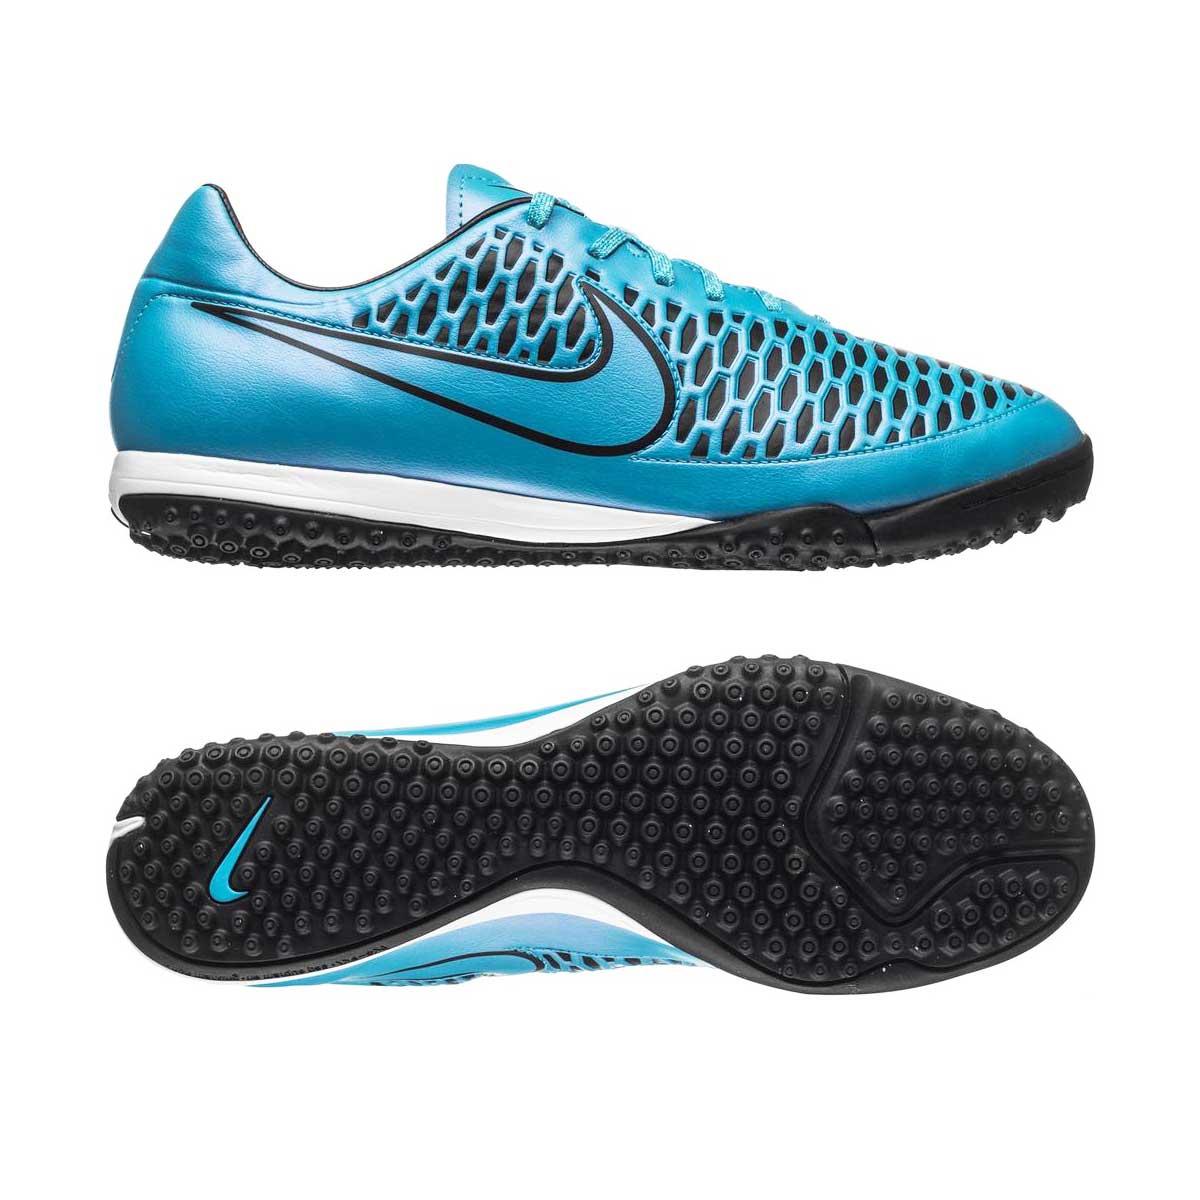 Football Shoes, Football, Sports, Buy, Nike, Nike Magista Onda TF Football  Shoes